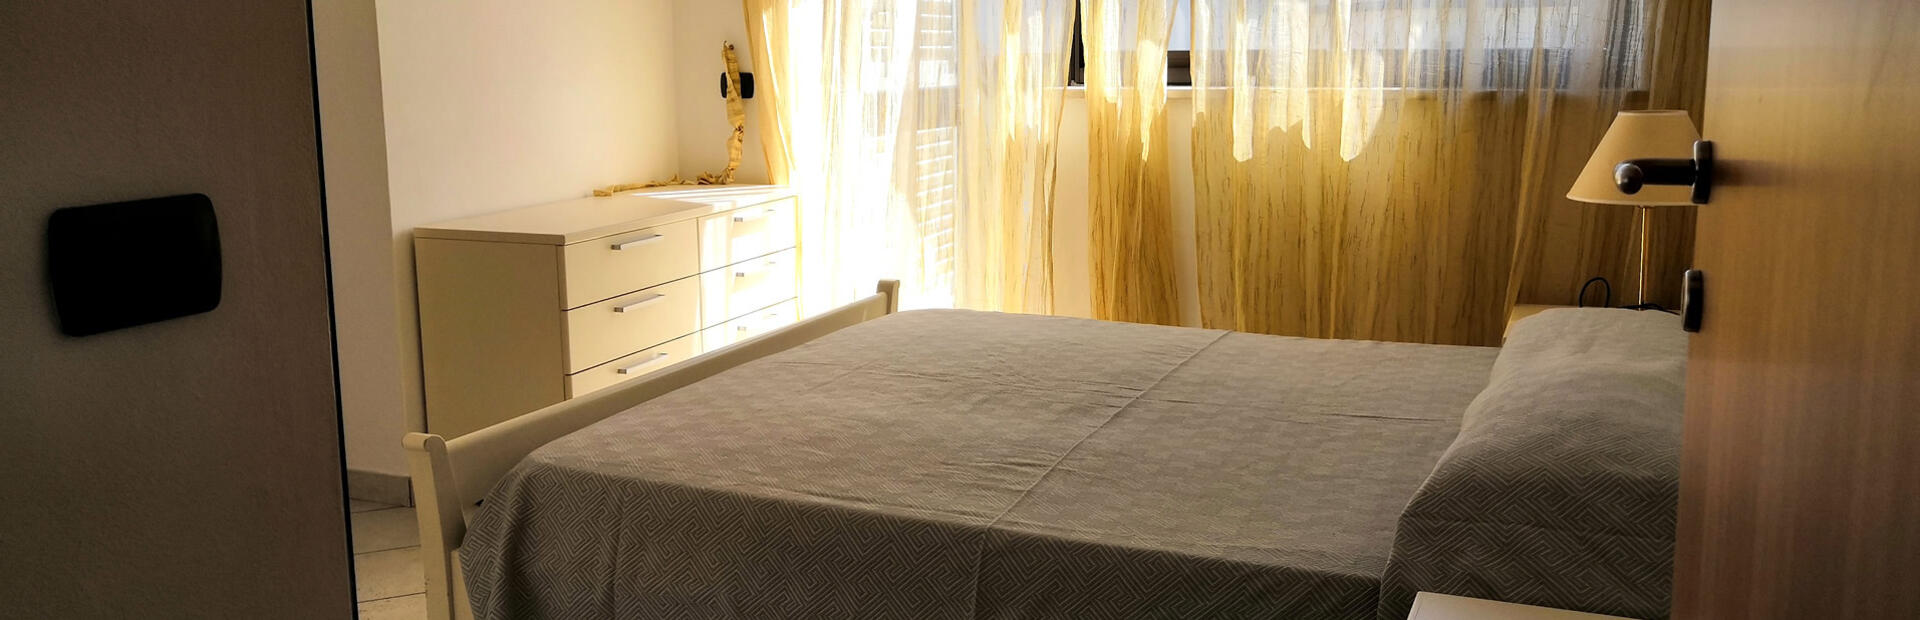 hotelgardencesenatico de hotel-mit-apartments-cesenatico 004